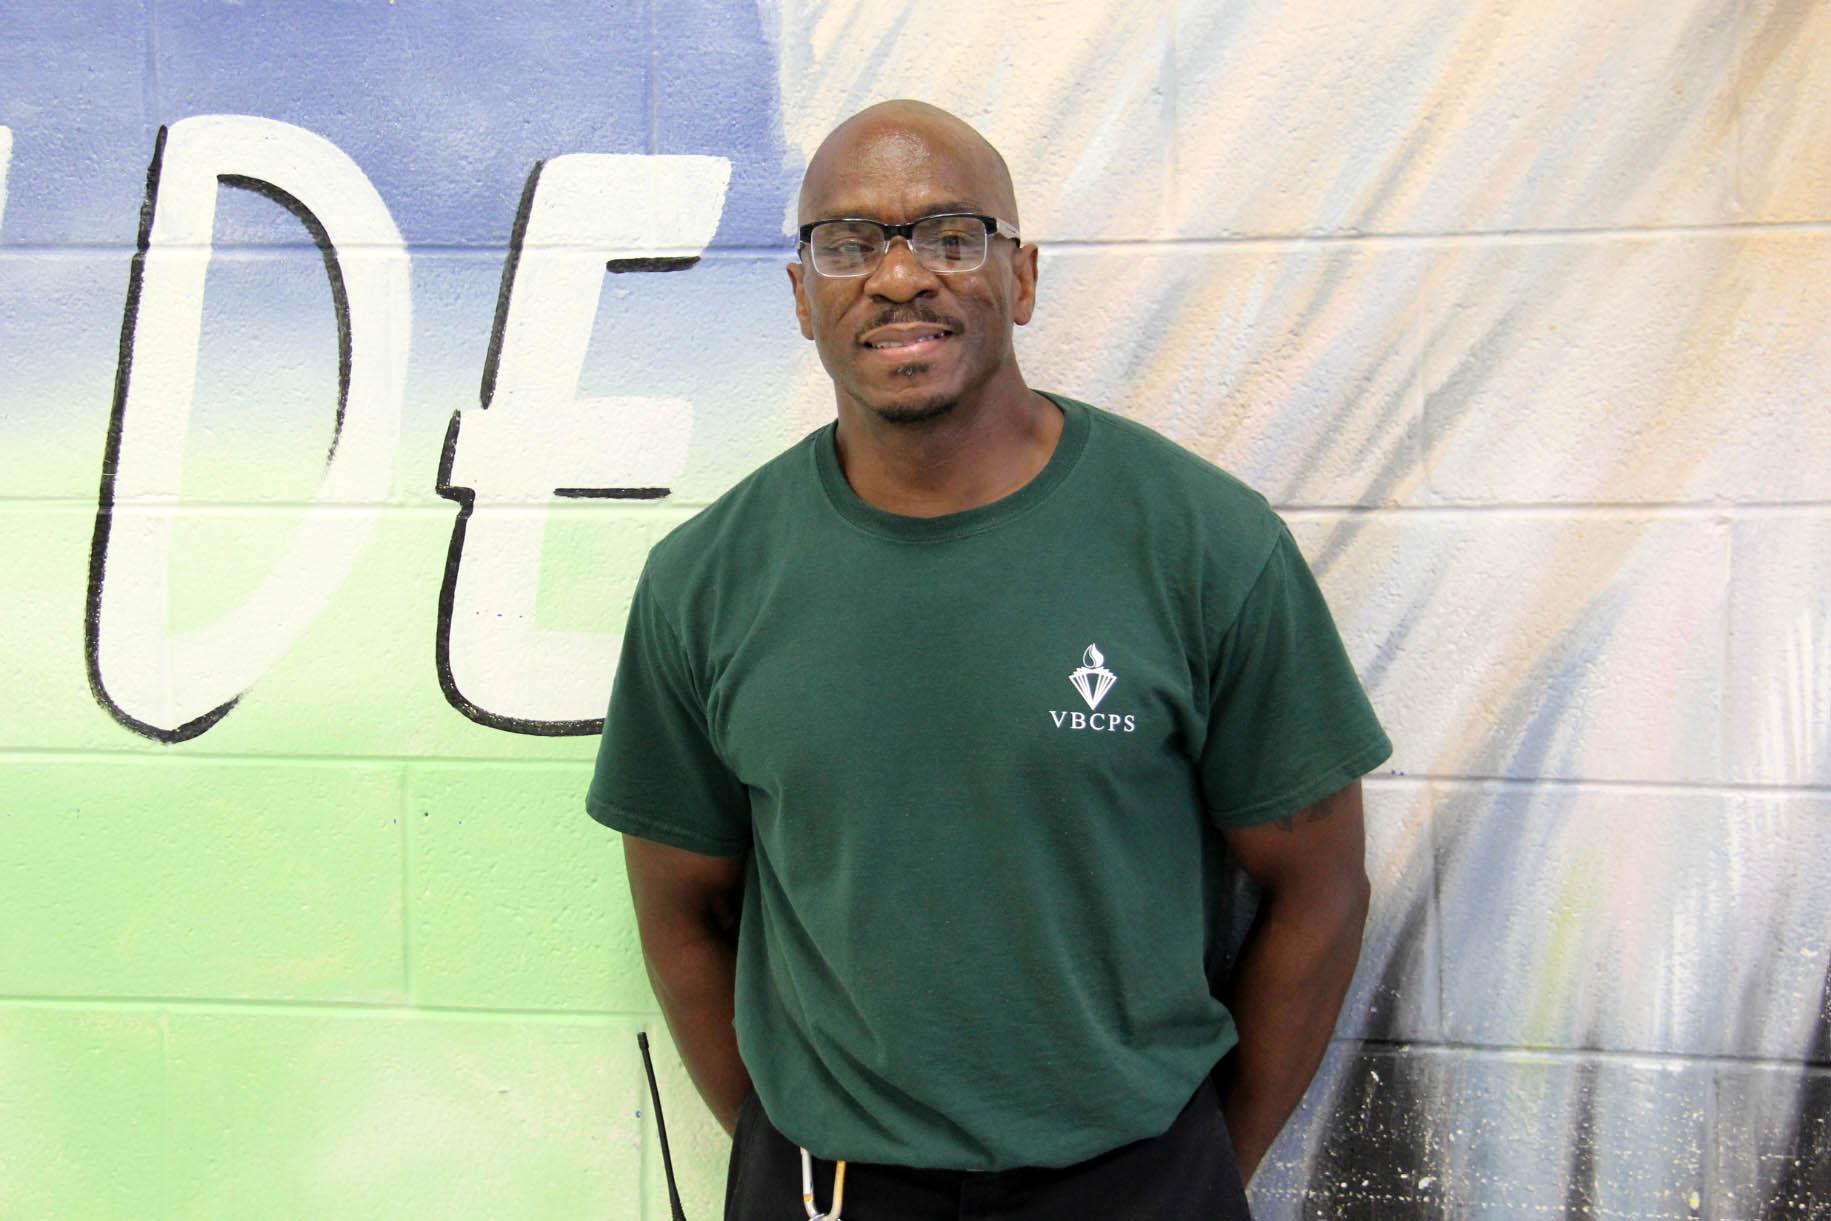 Williams custodian Jimmy Scurry 08-29-16